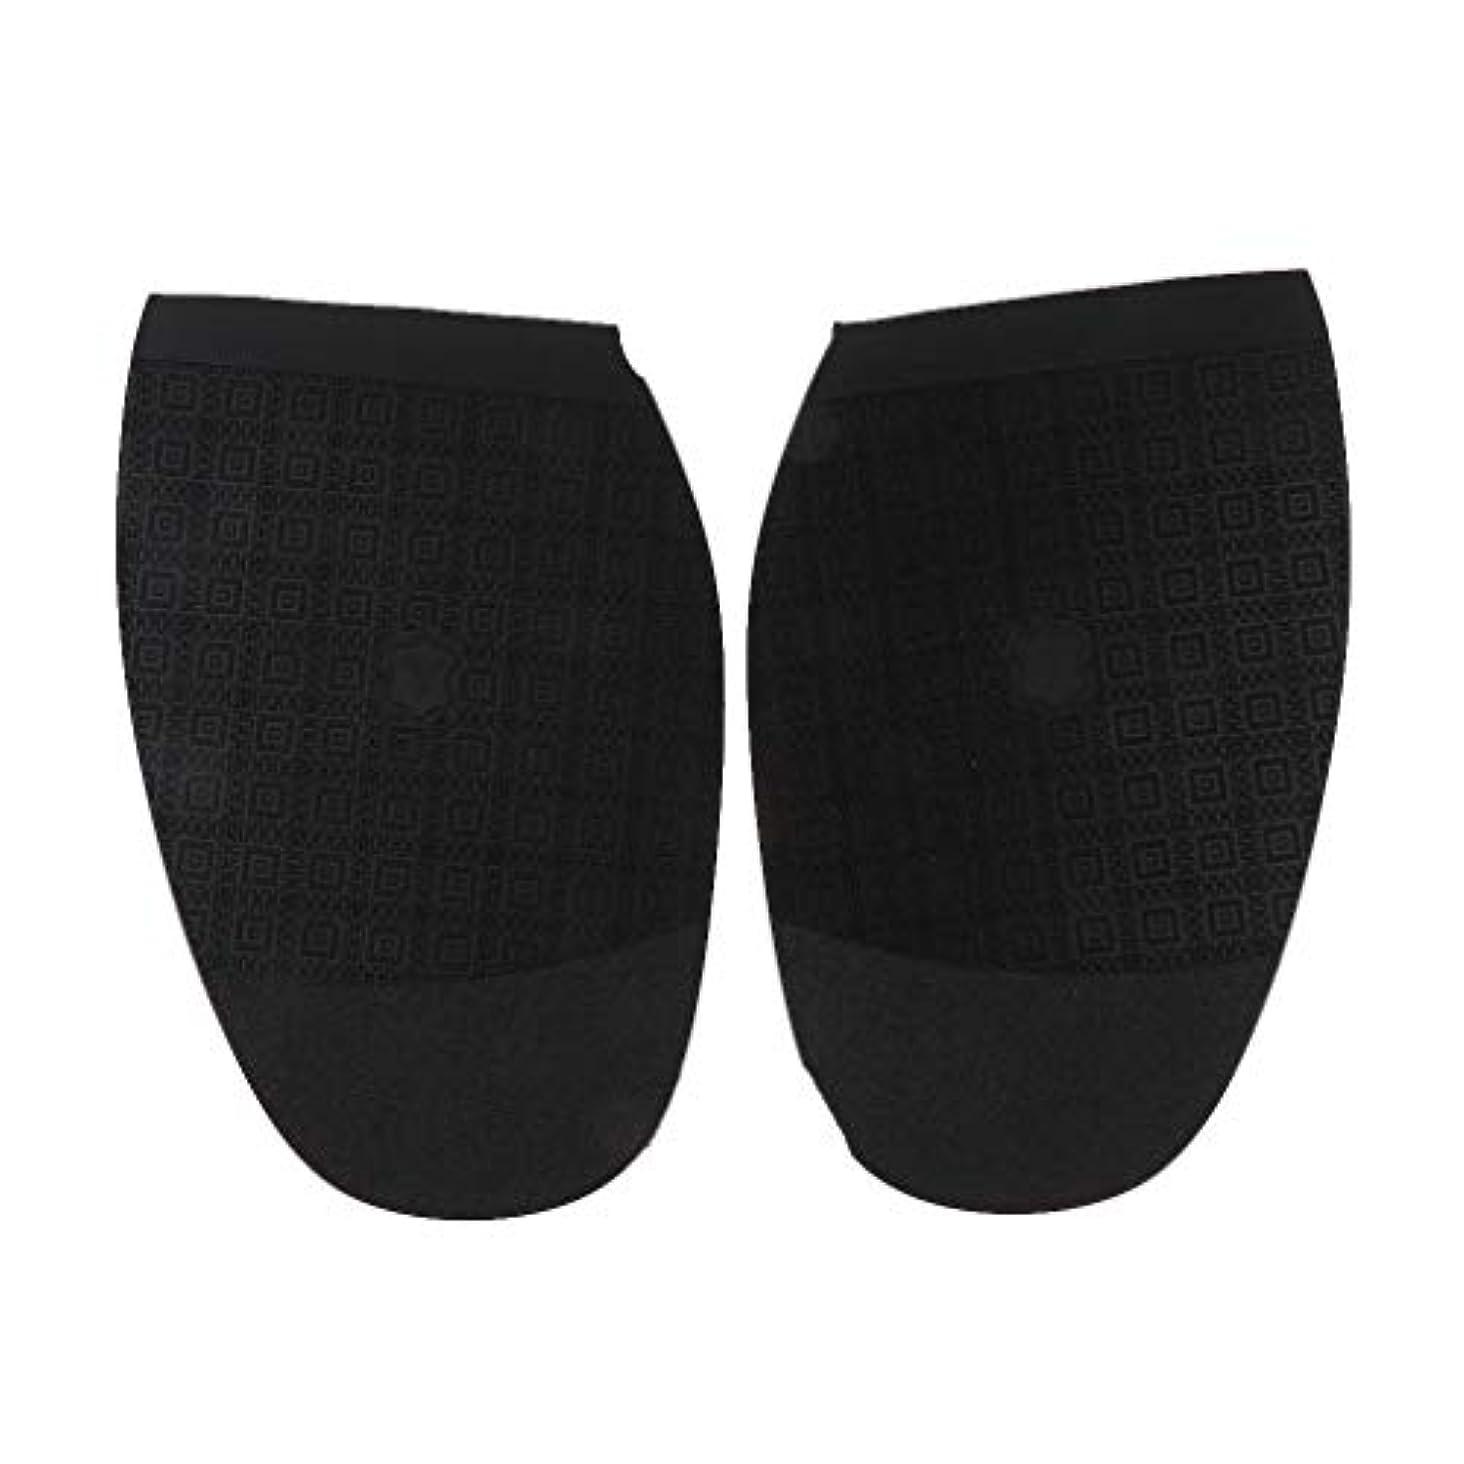 KESOTO シューズ補修材 前足パッド ゴム製 靴底補修シート 靴底用補修材 半底の交換 滑り止め